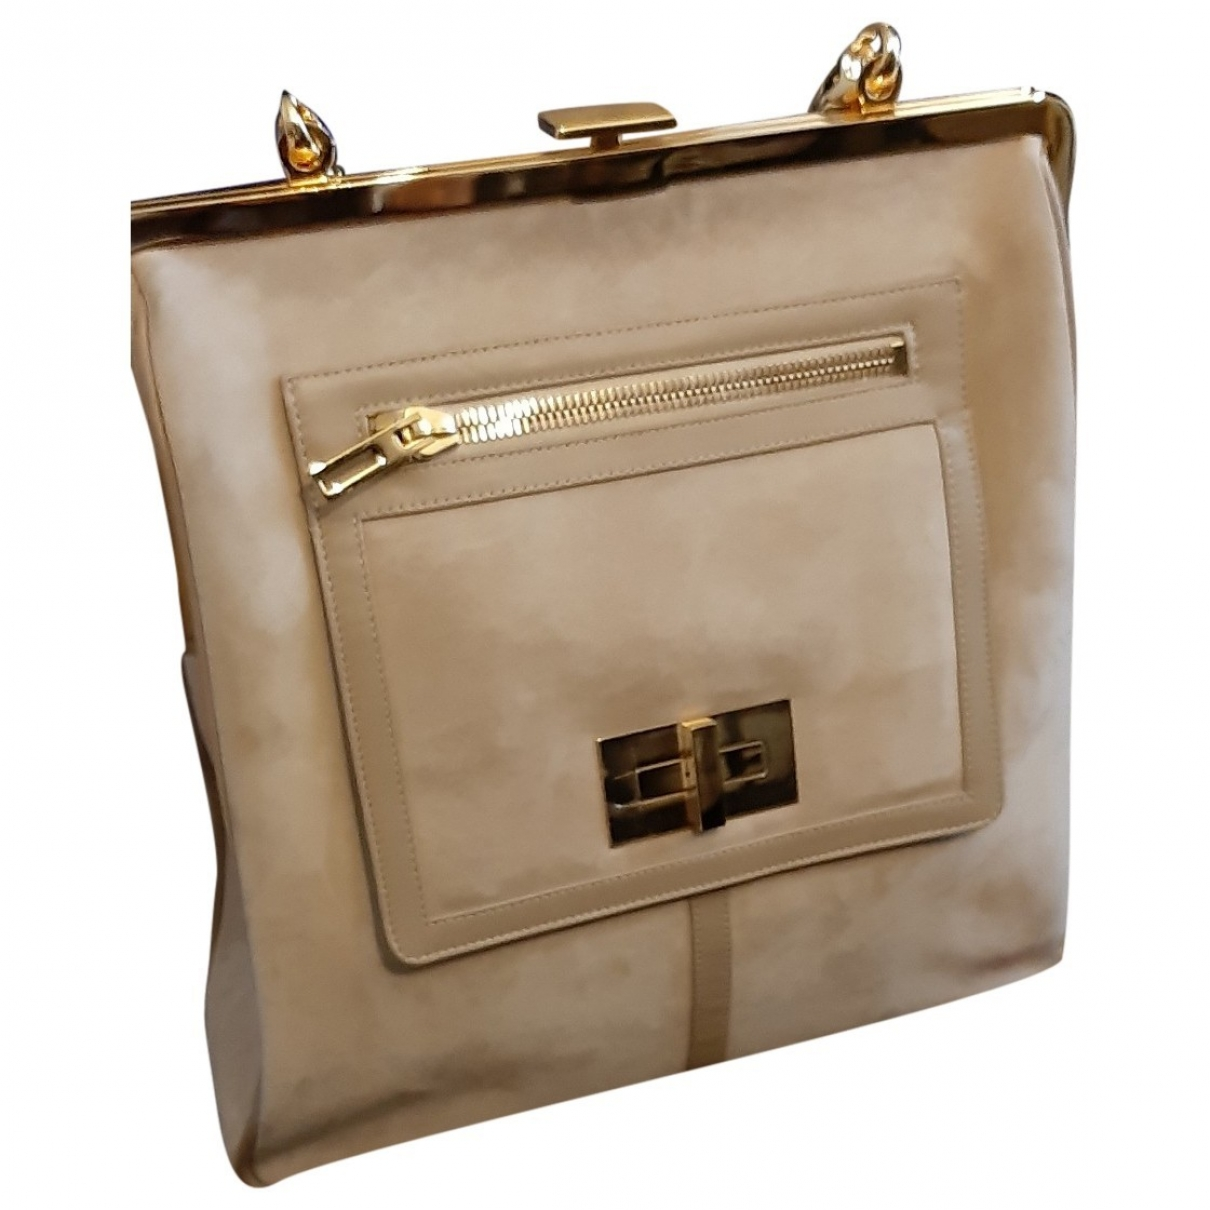 Pierre Balmain \N Ecru Leather handbag for Women \N